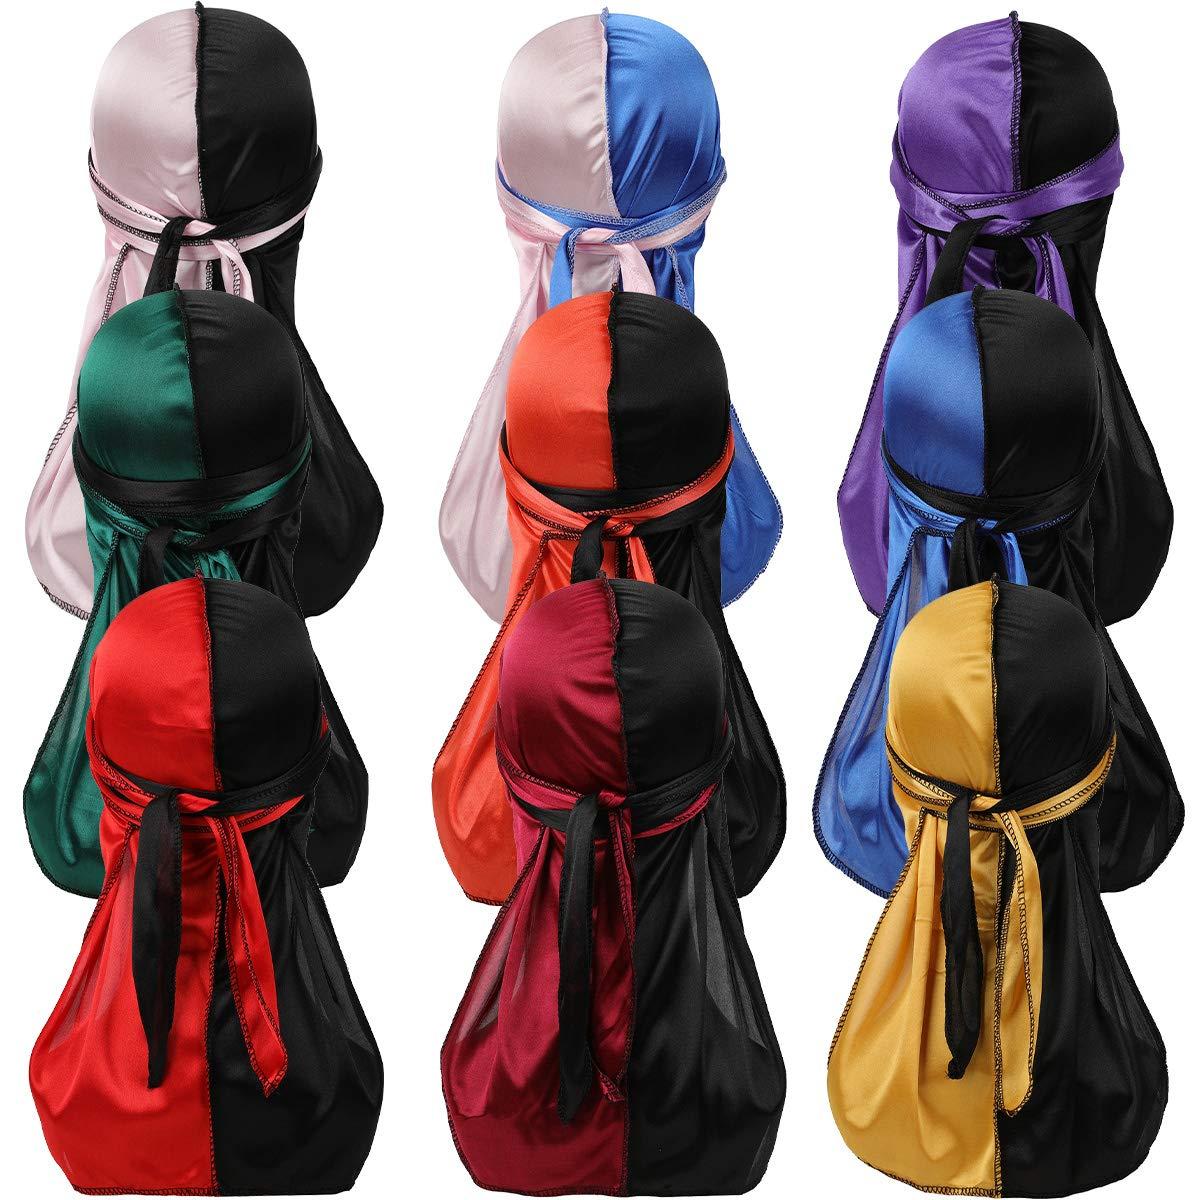 YI HENG MEI 2PCS/3PCS 360,540,720 Waves Color Block Silky Long Tail Durag Bandana Turban (561-Group 9(9 Pieces))